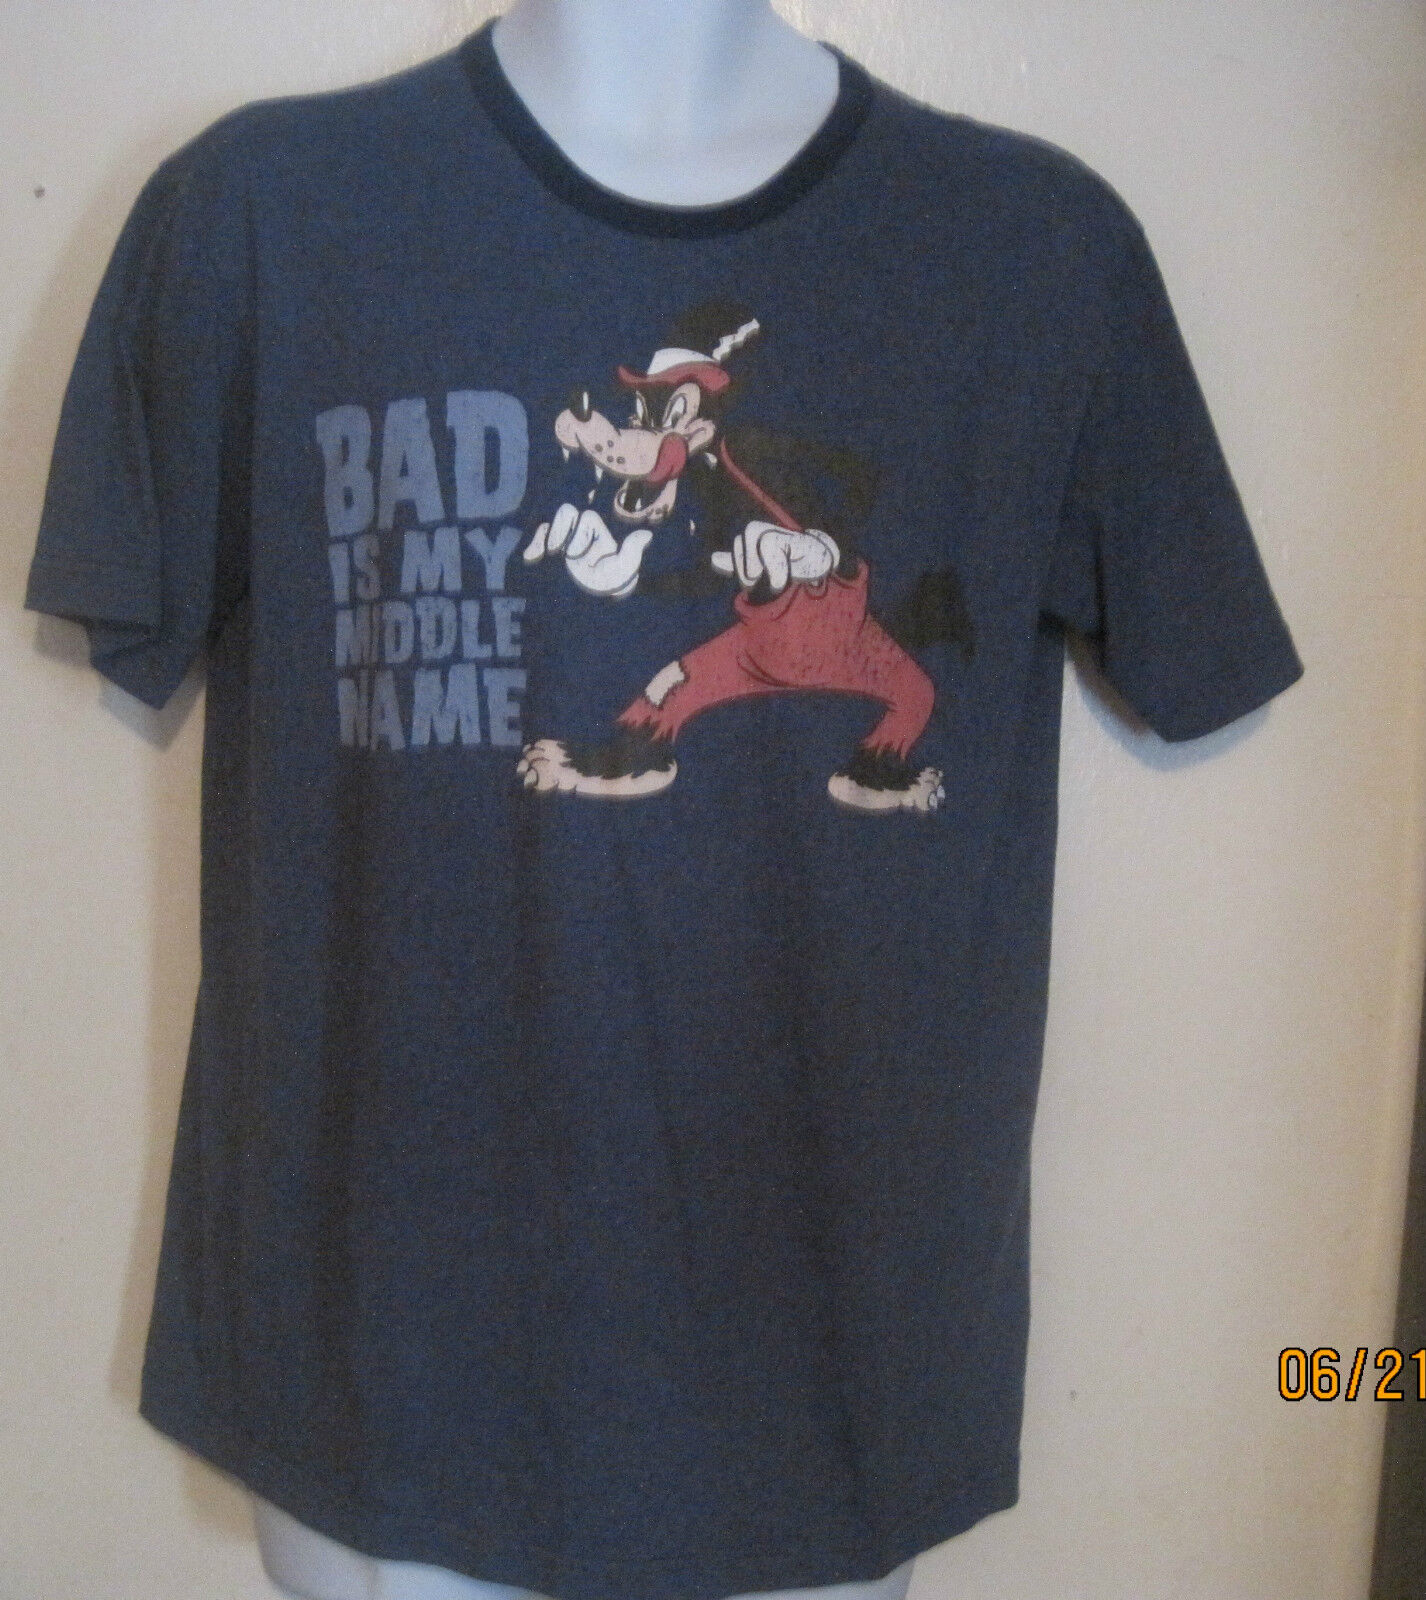 b83fc6eb756 Disney Store Bad Is My Middle Name Tee T Shirt Mens M Medium Big Bad Wolf